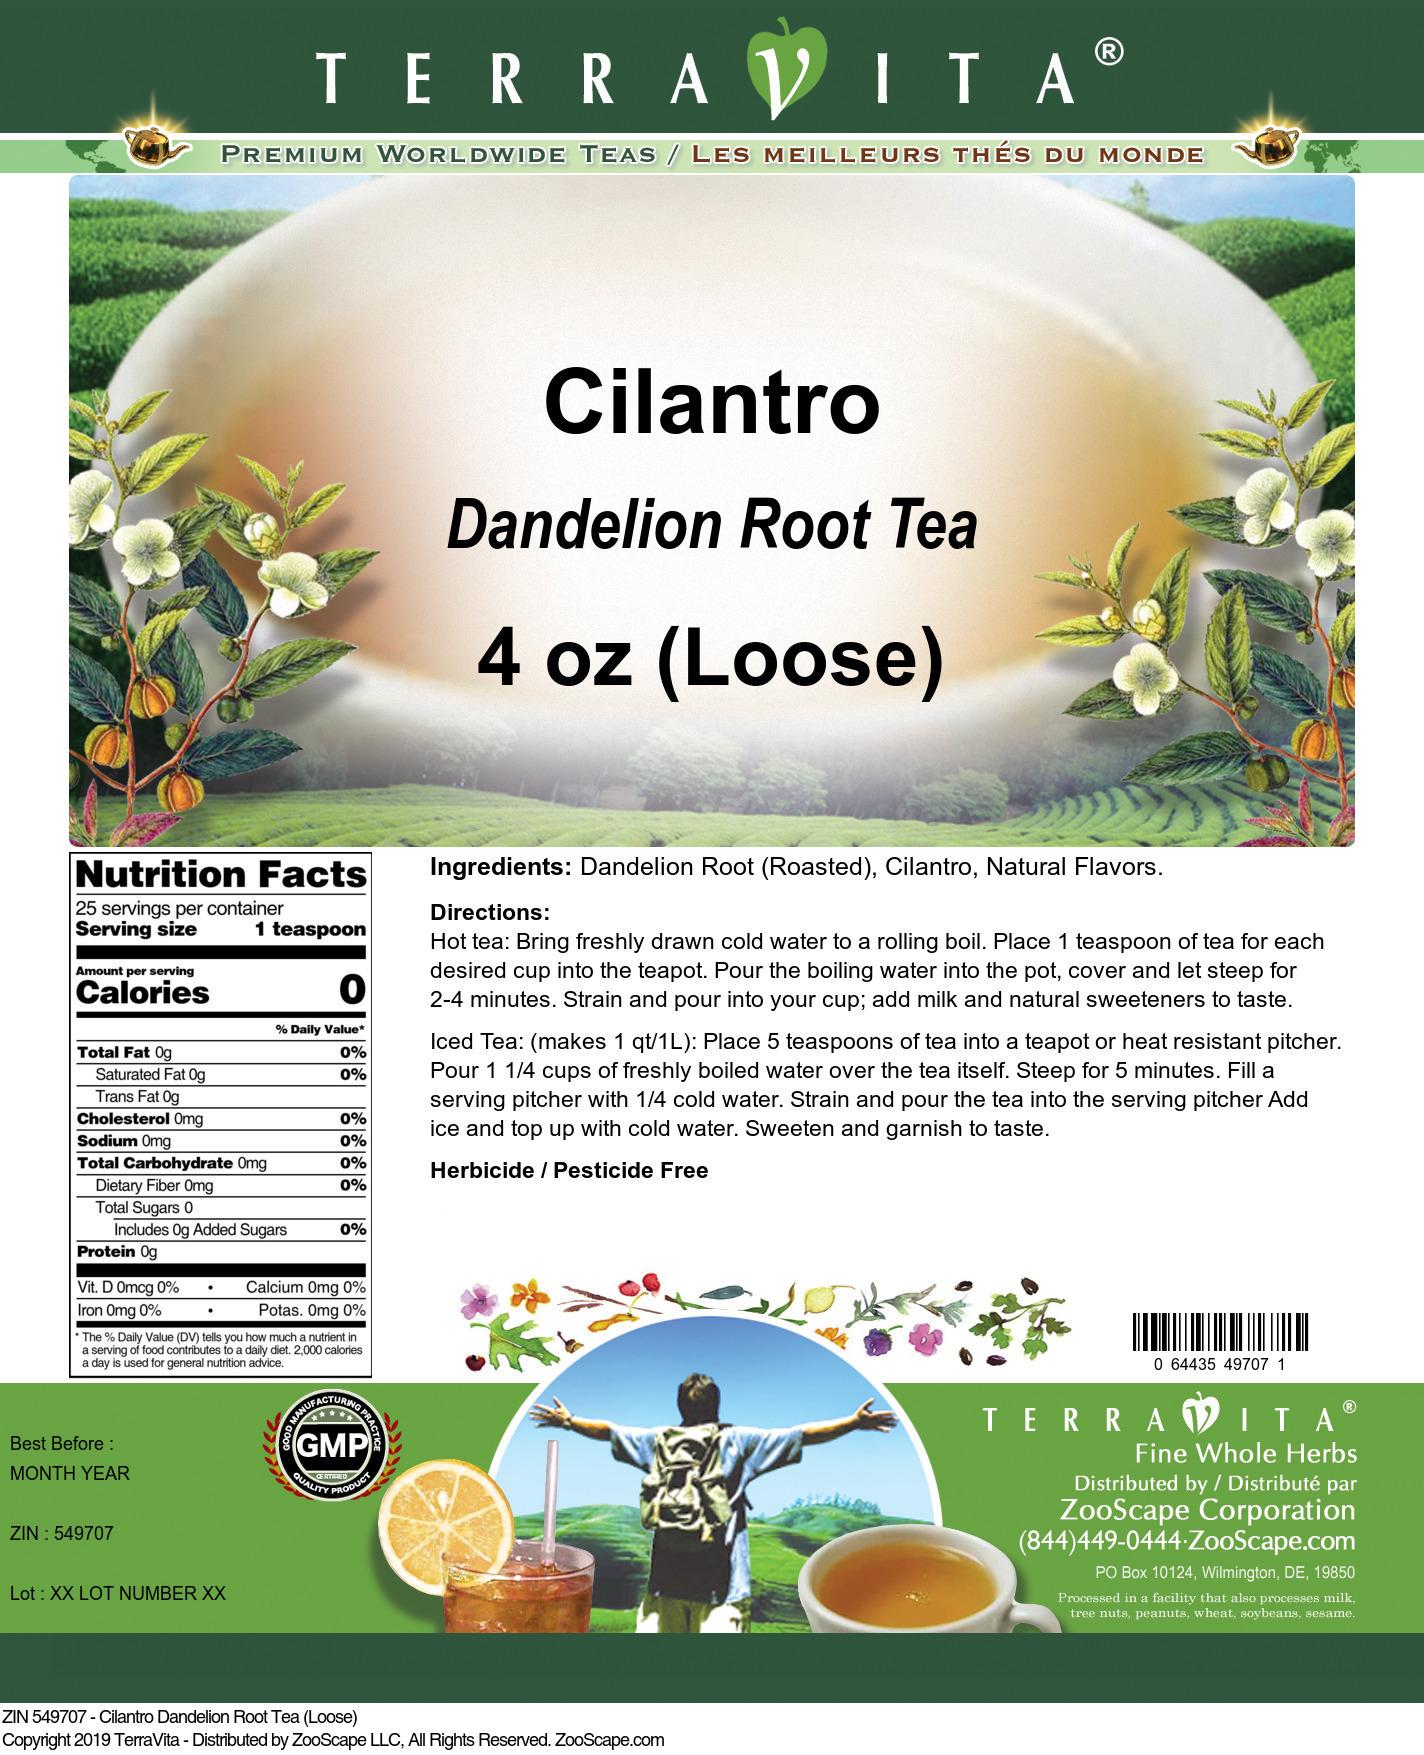 Cilantro Dandelion Root